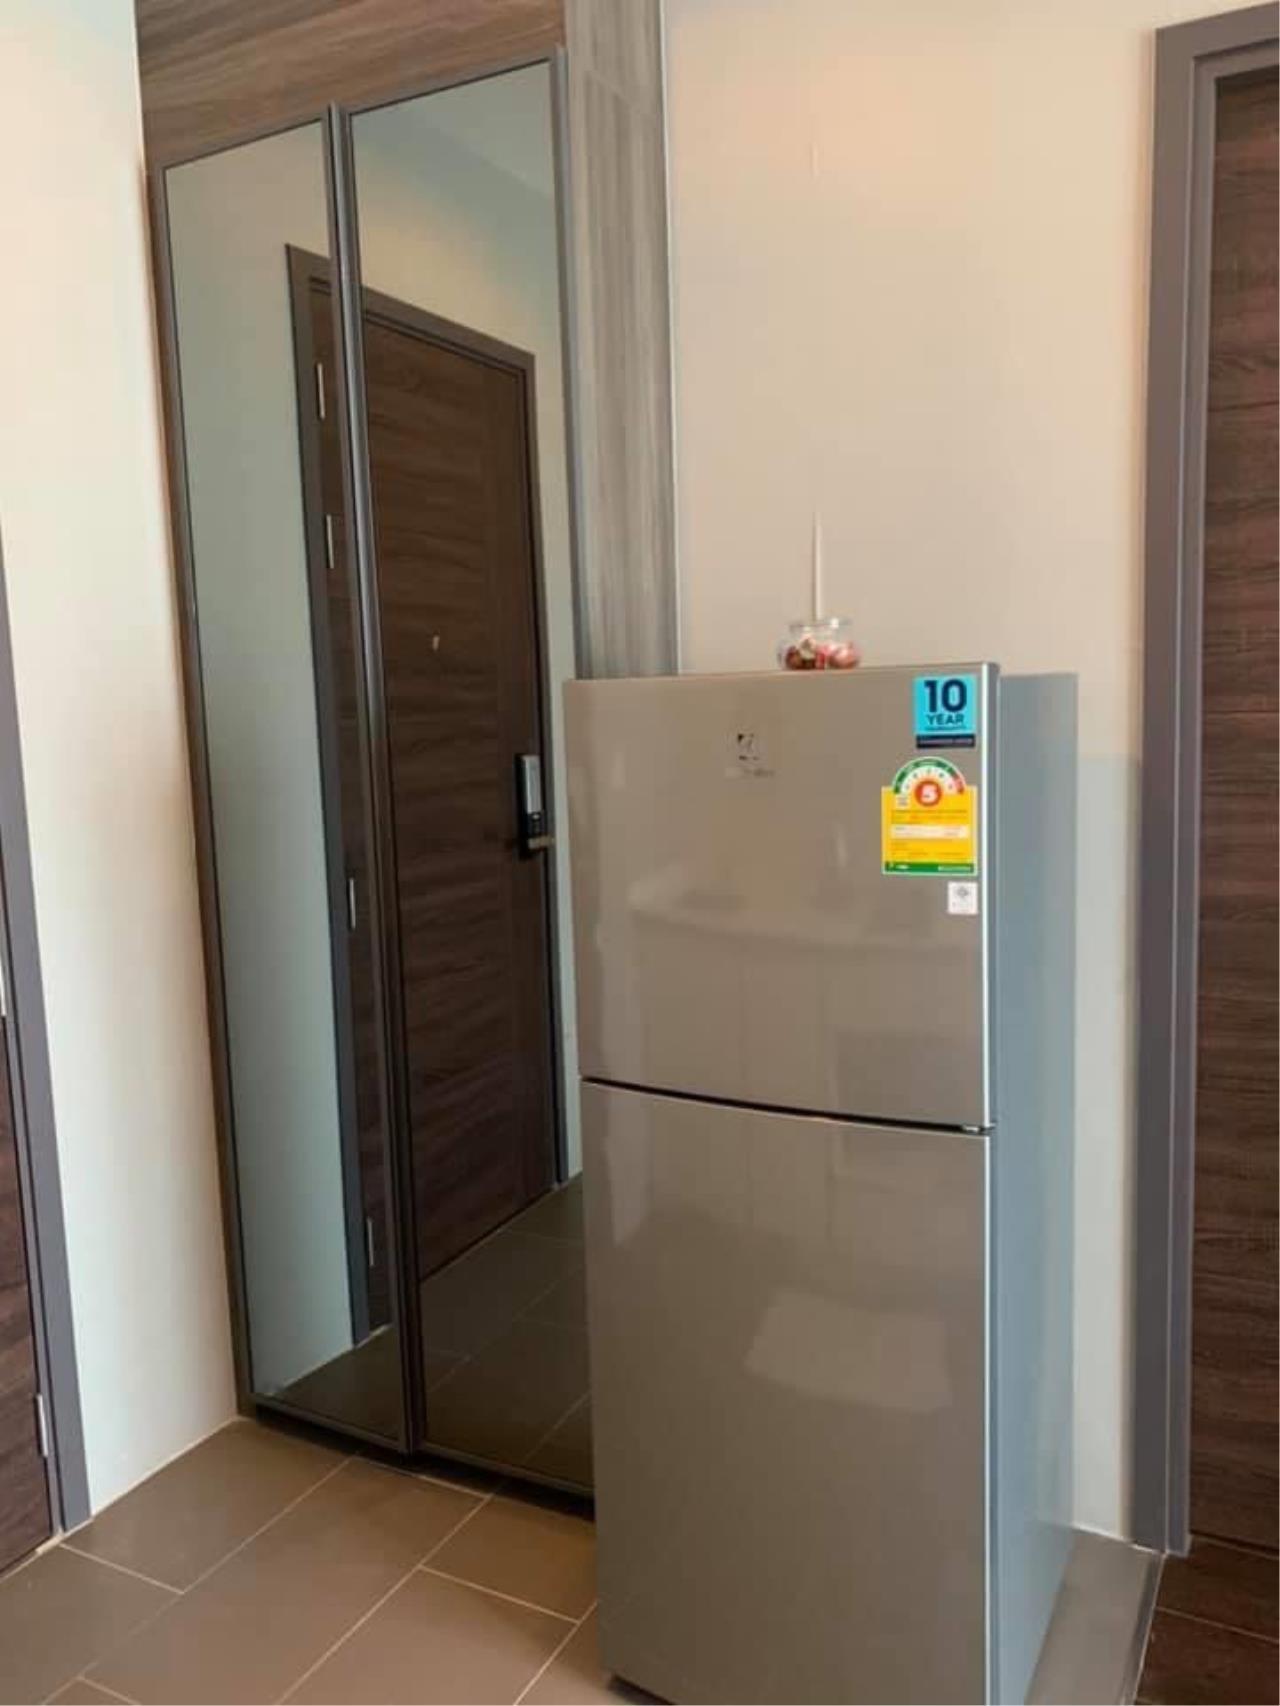 Agent - Phapayawarin Agency's C Ekkamai for Rent, 1 Bedroom 1 Bathroom, 32 Sq.m., BTS Ekkamai   8